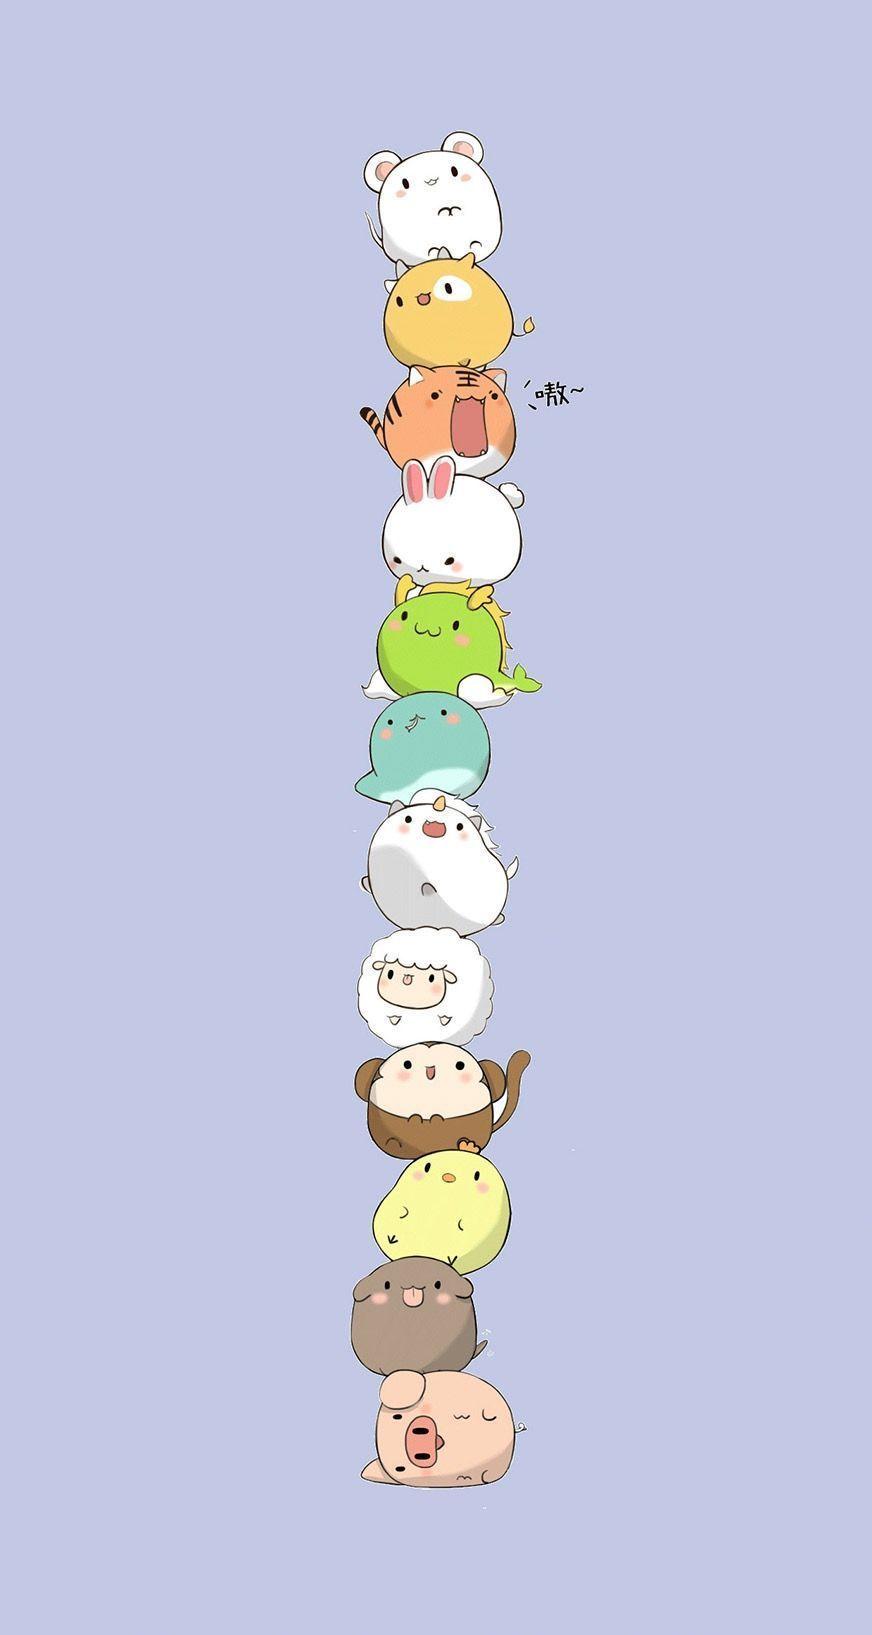 Sorpresas De Papel Cute Cartoon Wallpapers Download Cute Wallpapers Cute Wallpapers